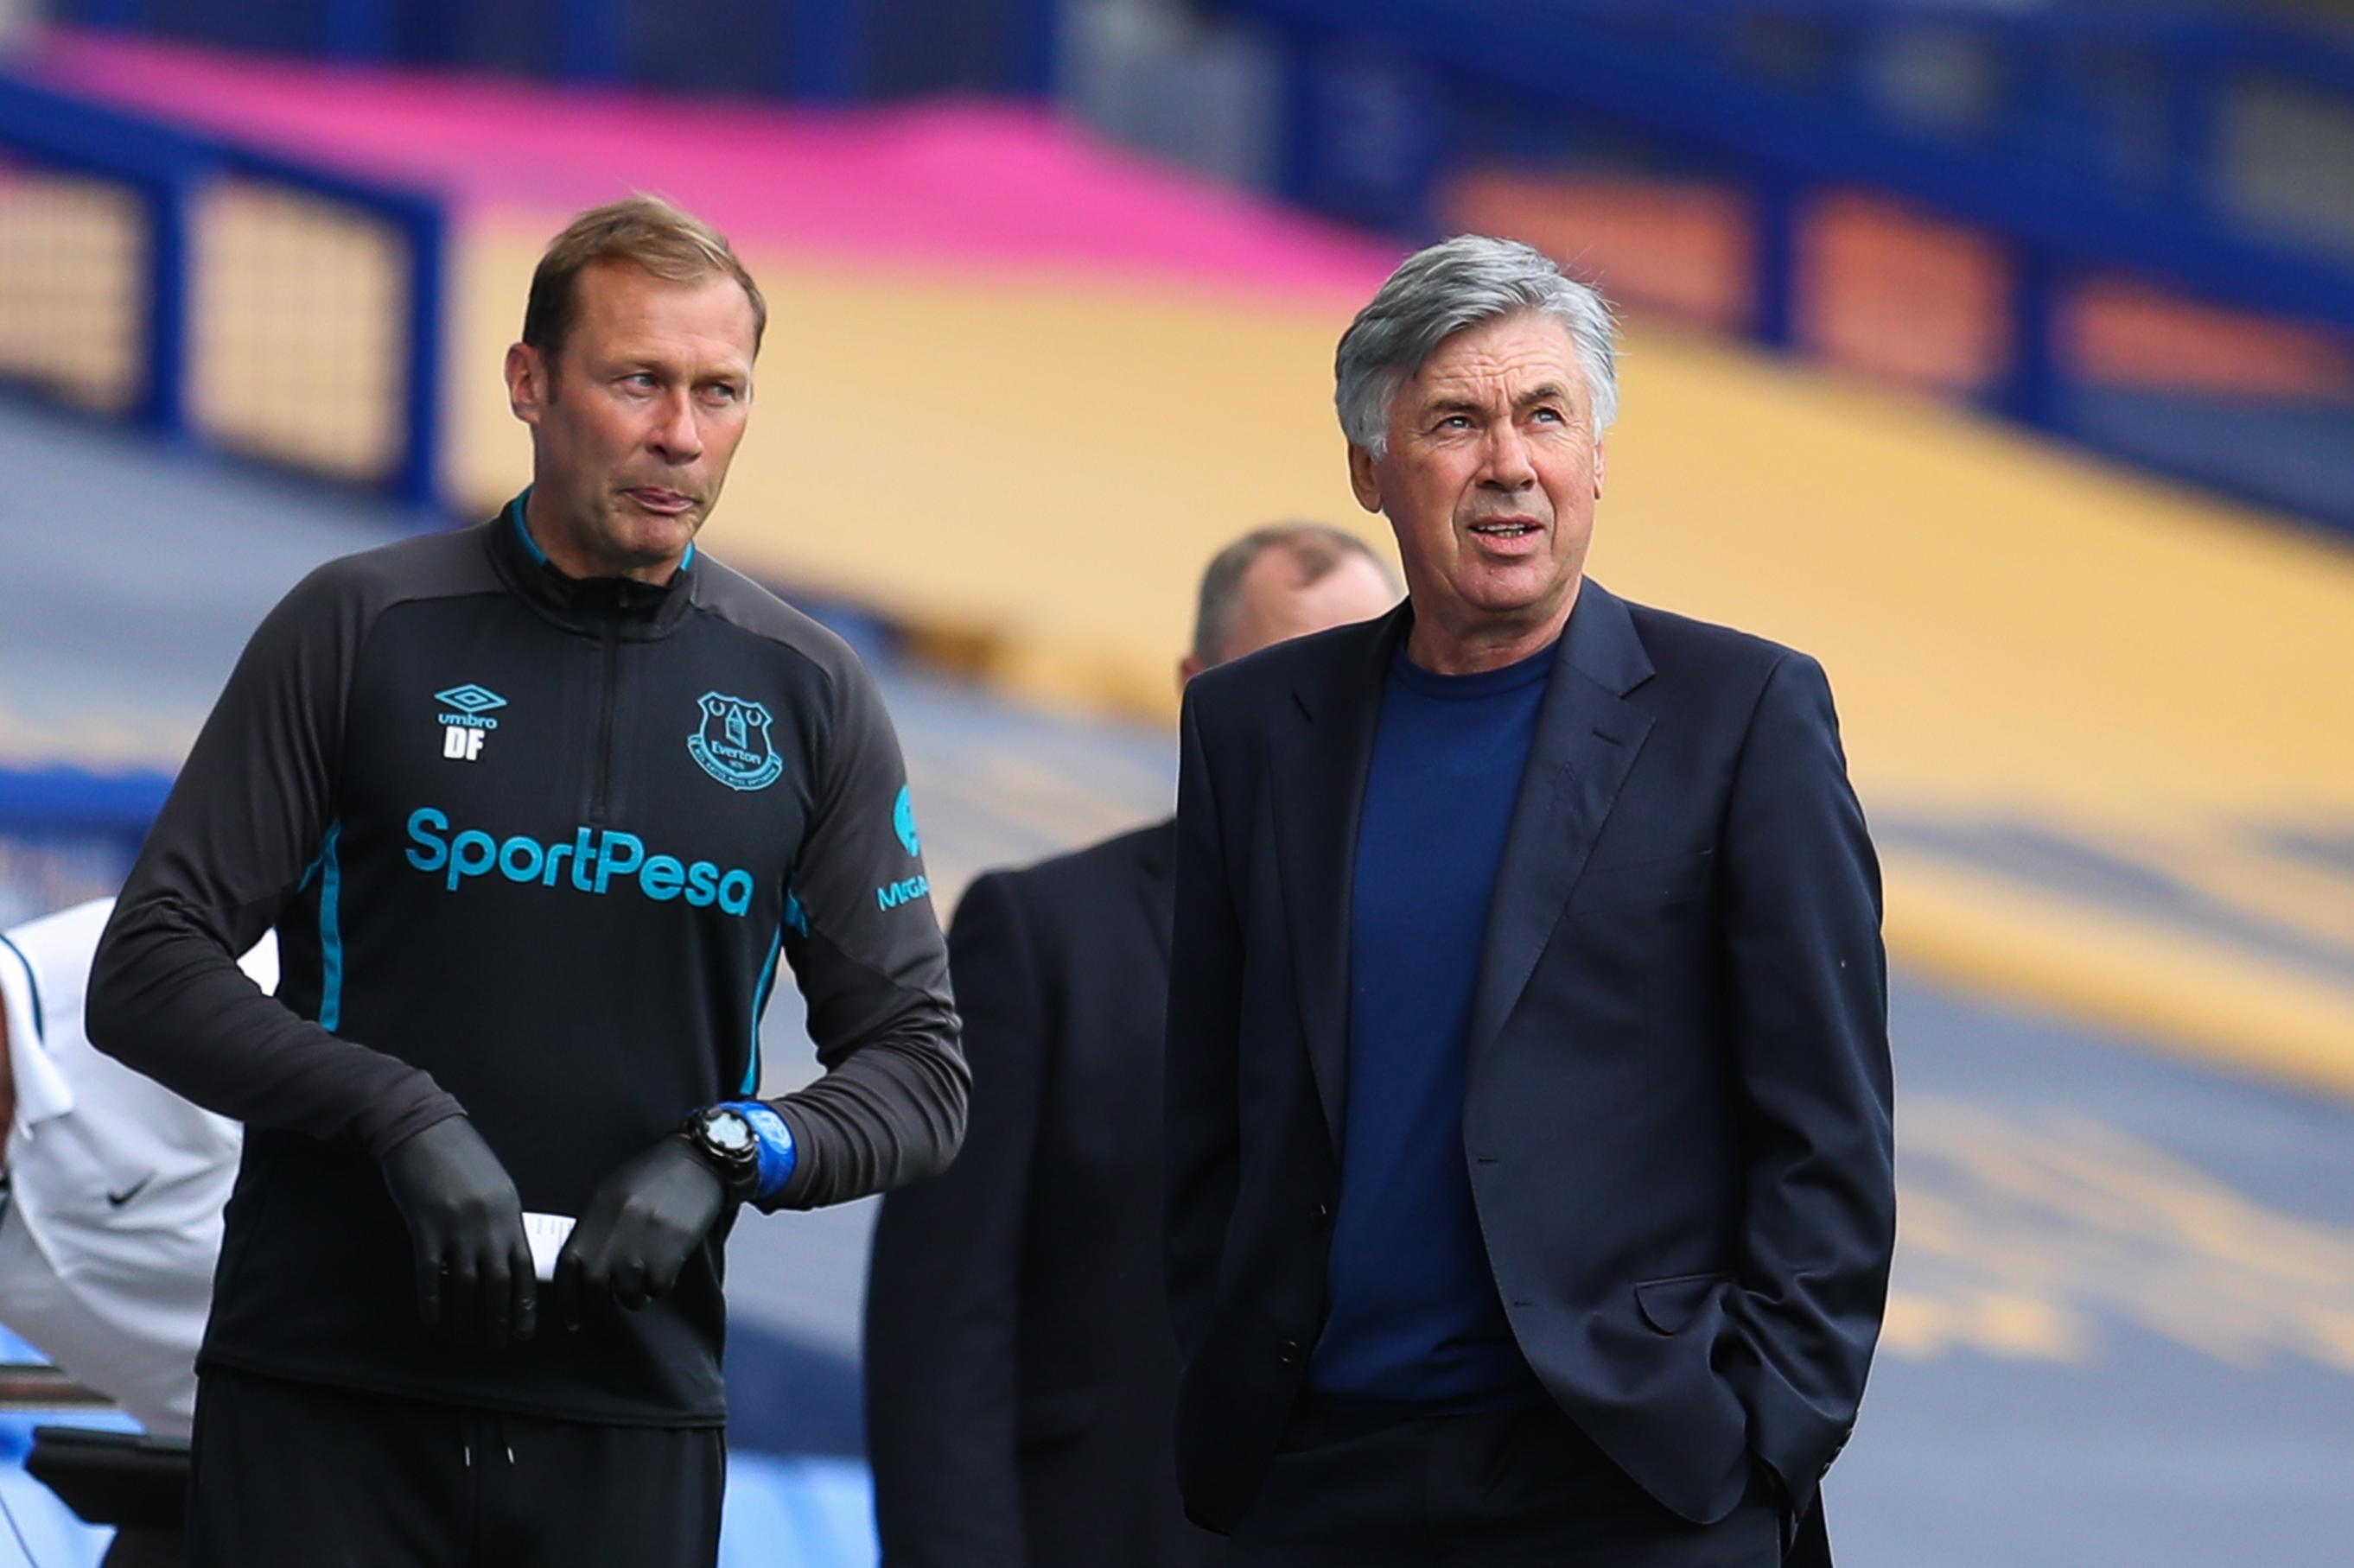 Everton's 2019-20 Premier League Season Review (Everton manager Carlo Ancelotti seen in the picture)